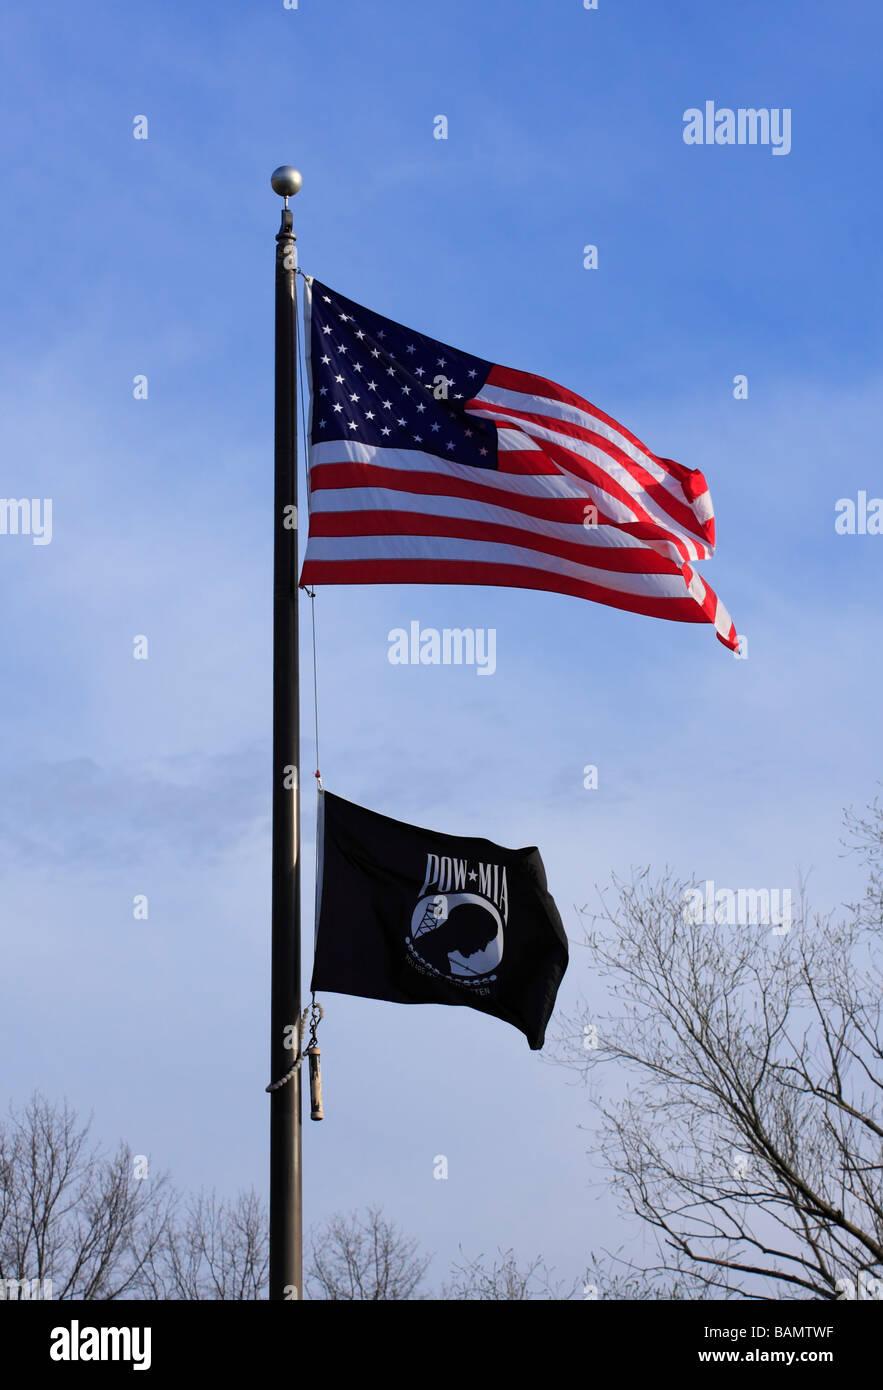 United States and P.O.W. M.I.A. Flag on flagpole. - Stock Image